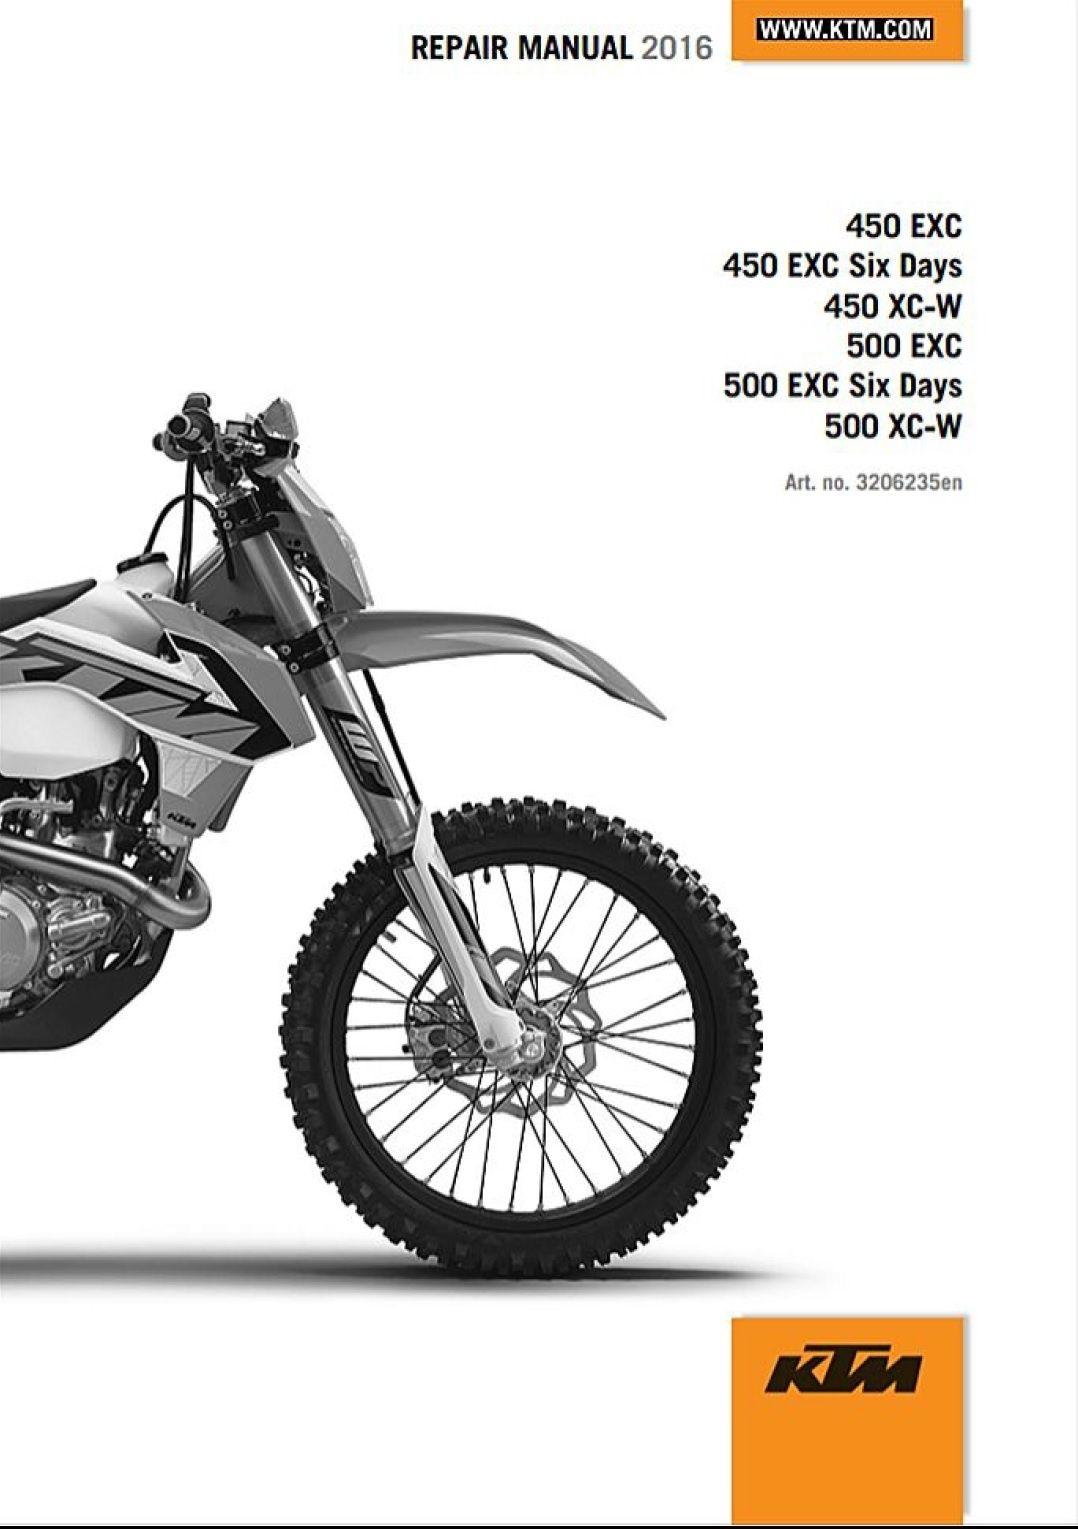 medium resolution of 2016 ktm 450 500 exc xc w 6days service repair manual